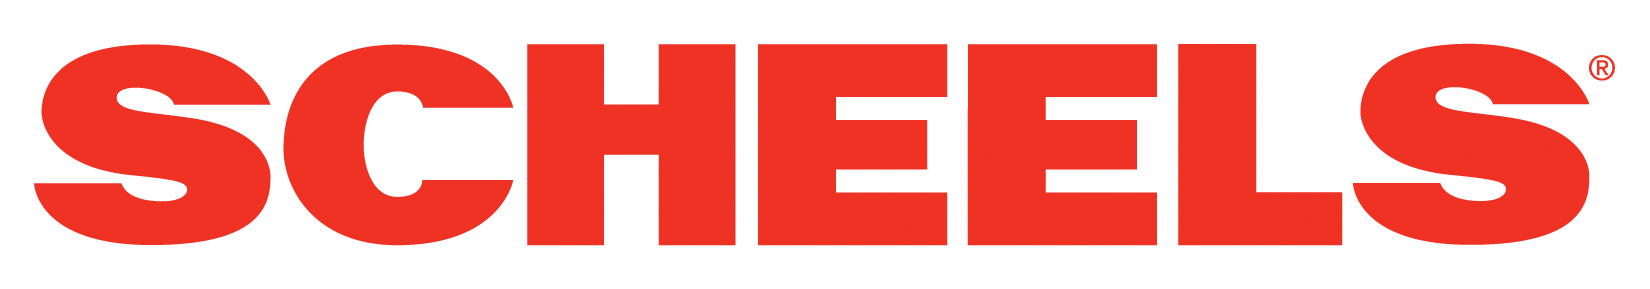 scheels-logo-honoring-americas-heroes-impact-iowa